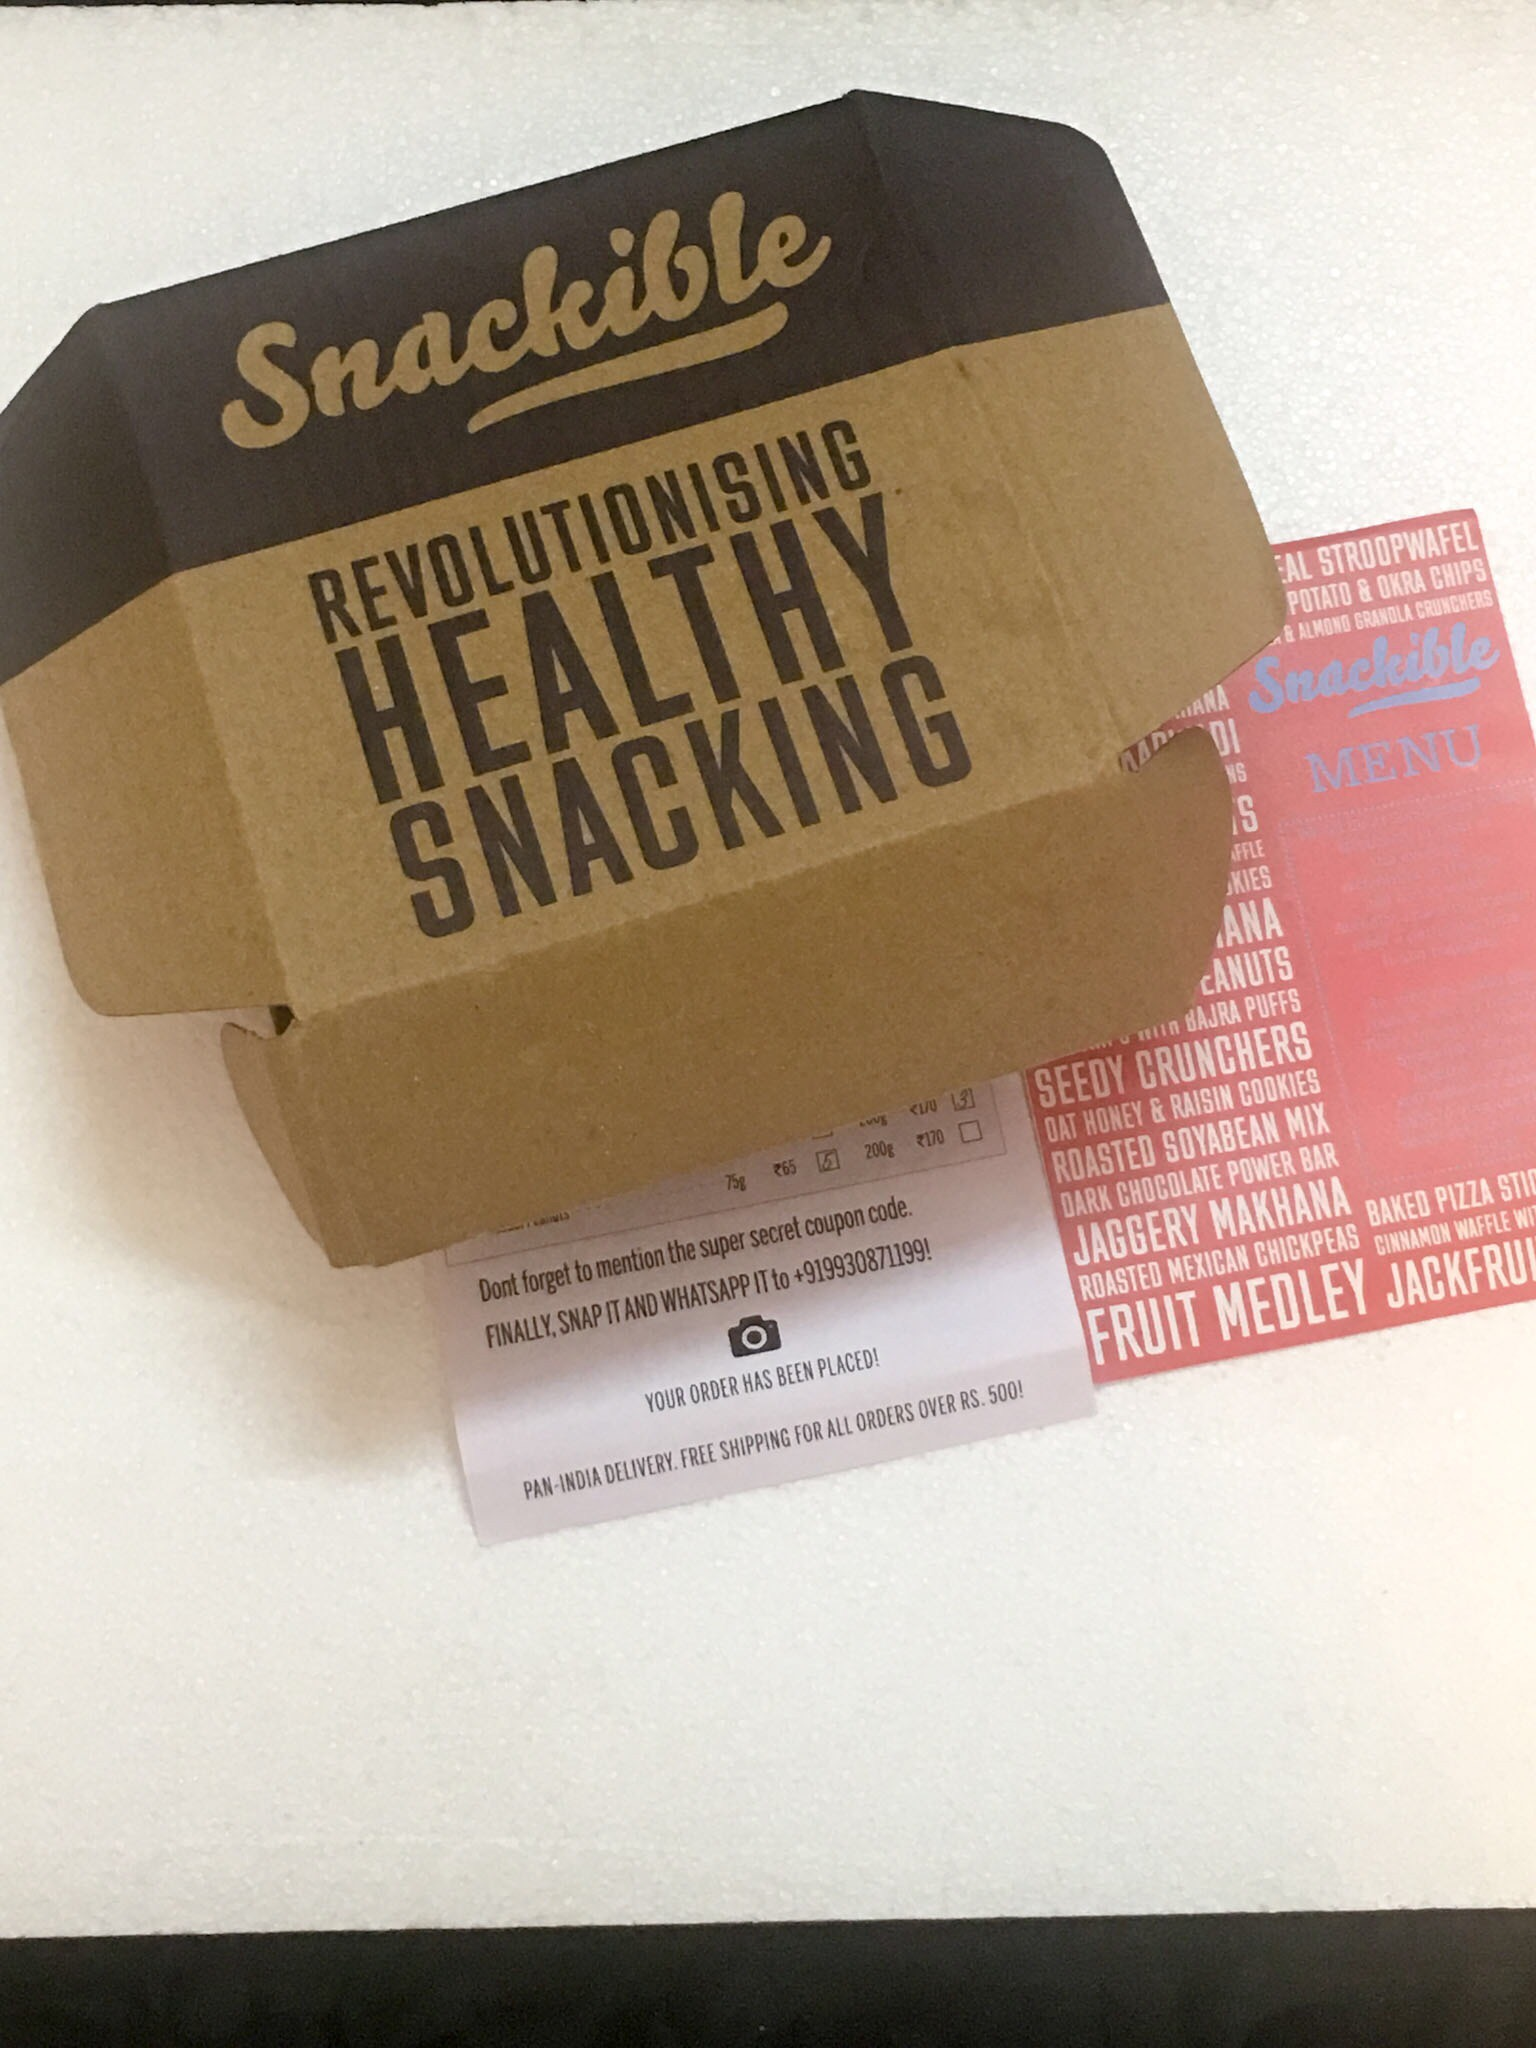 Snackible Snacks (Giveaway)